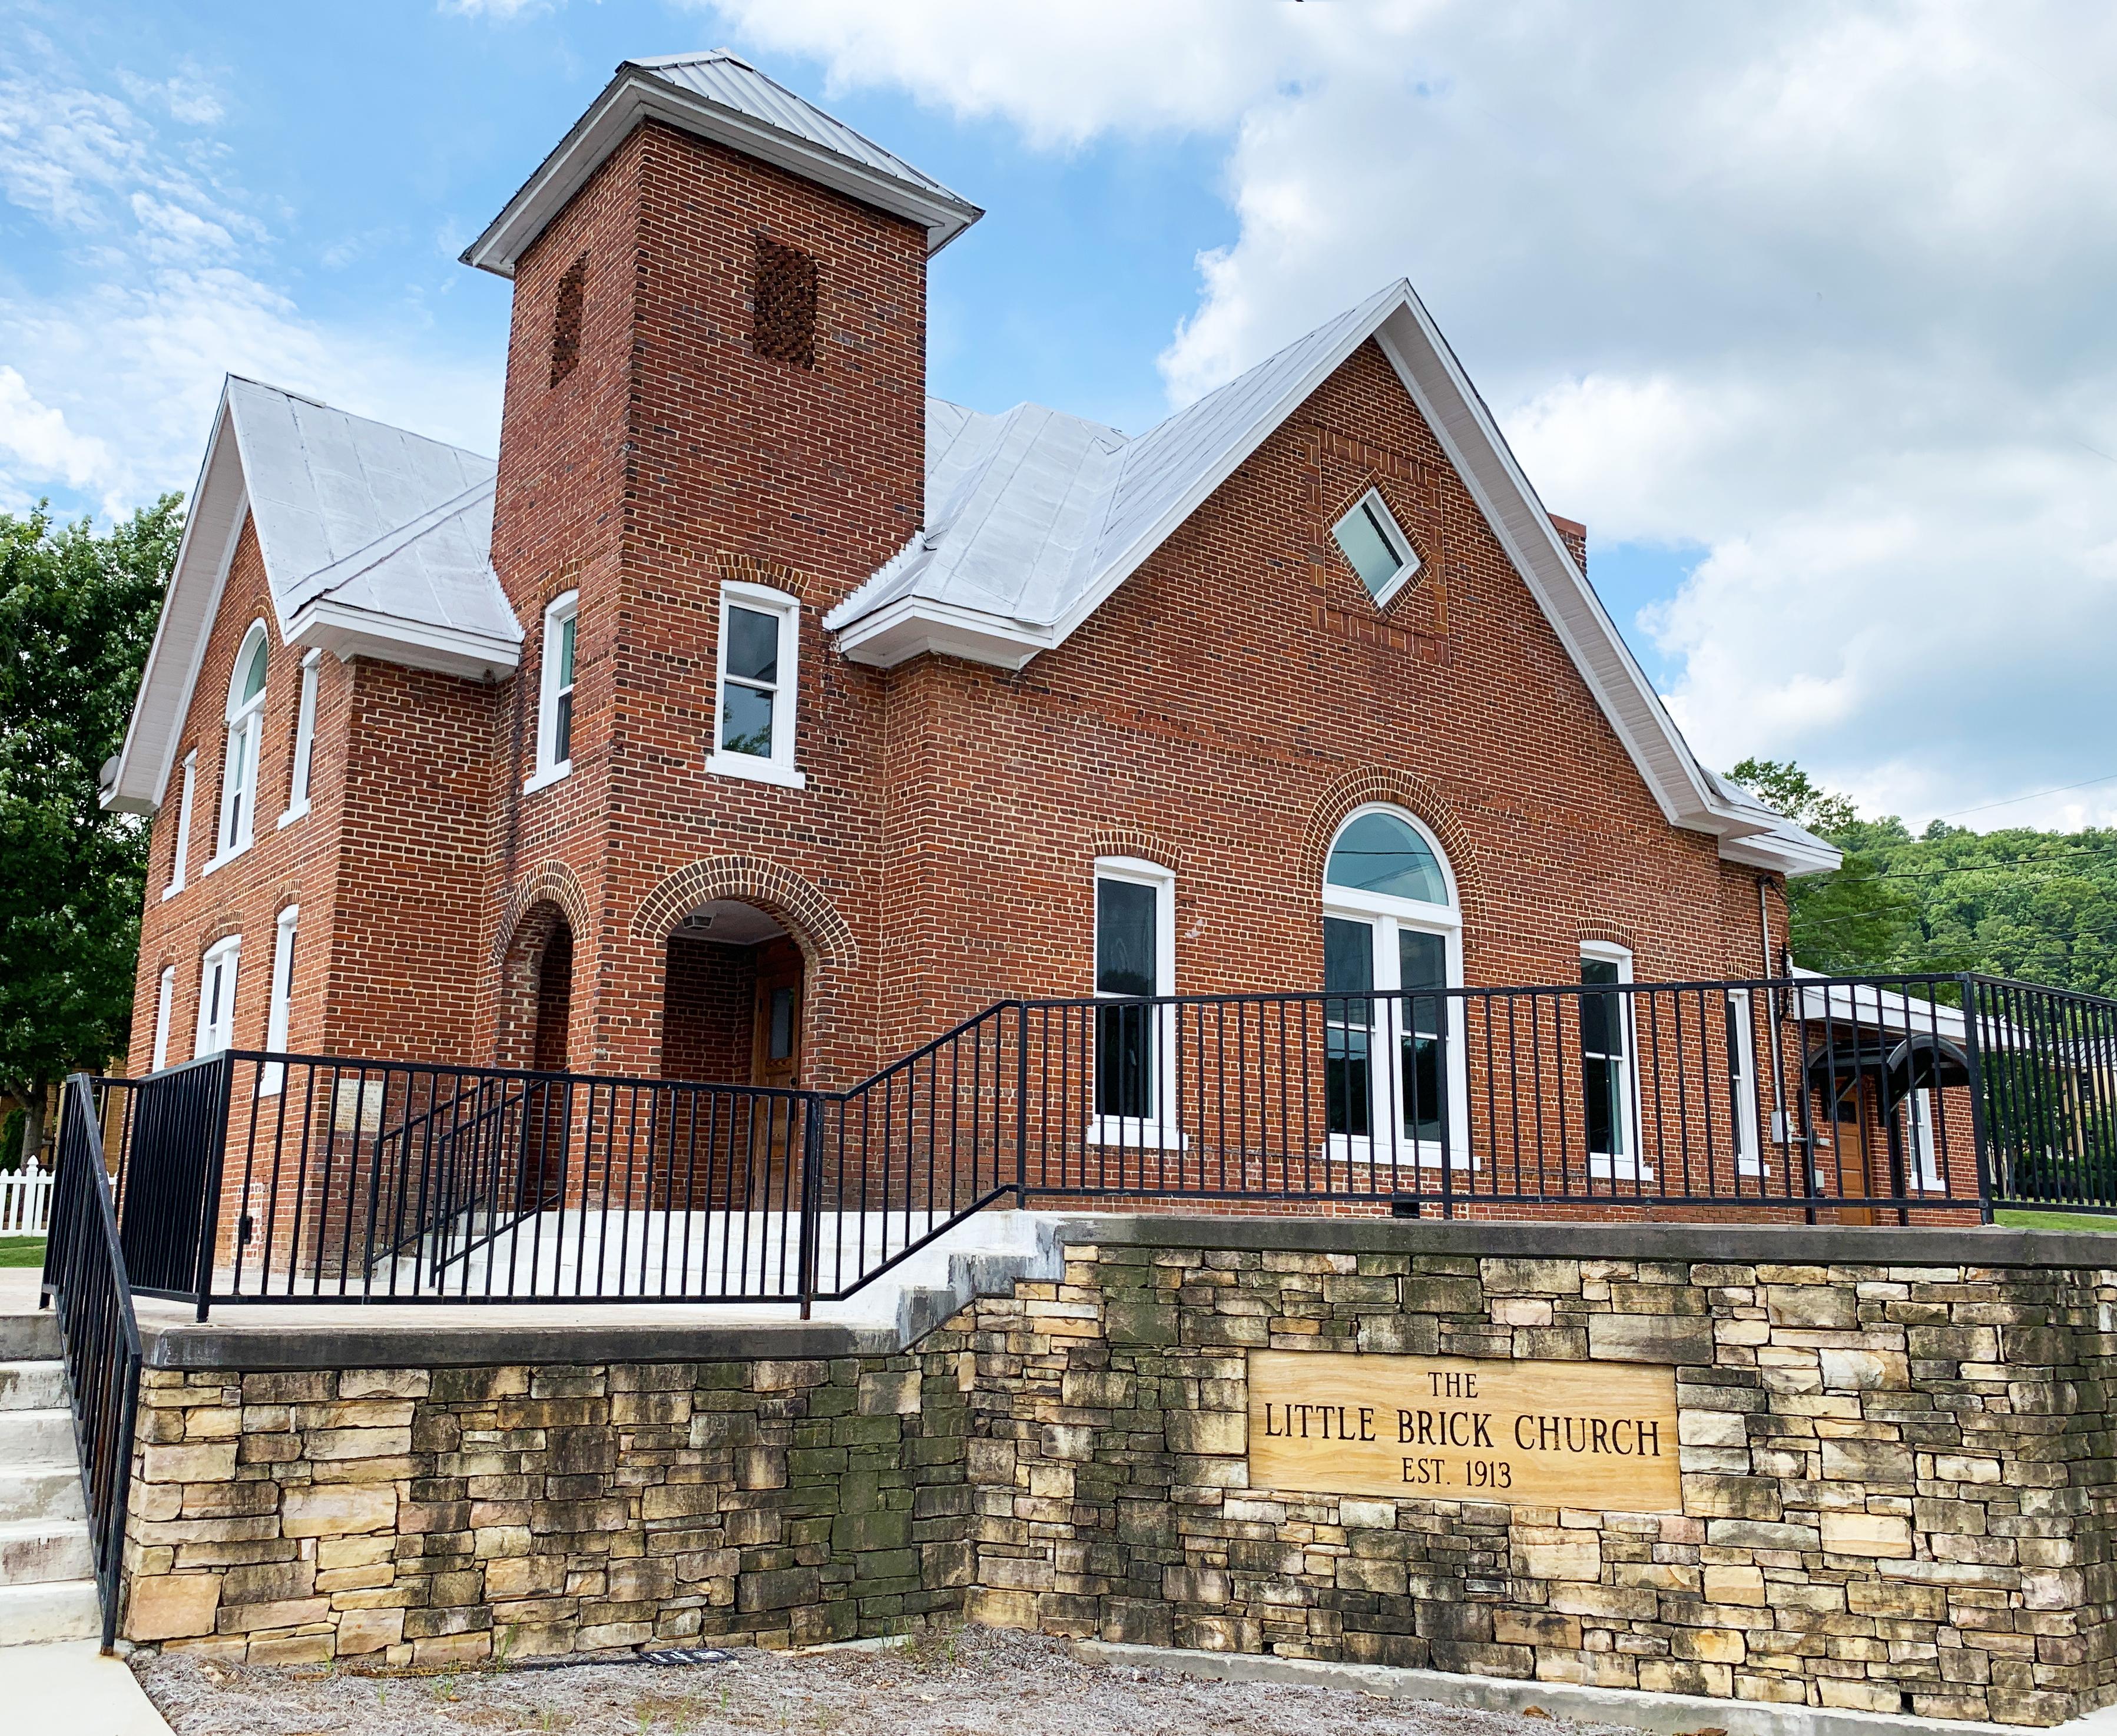 The Historic Little Brick Church